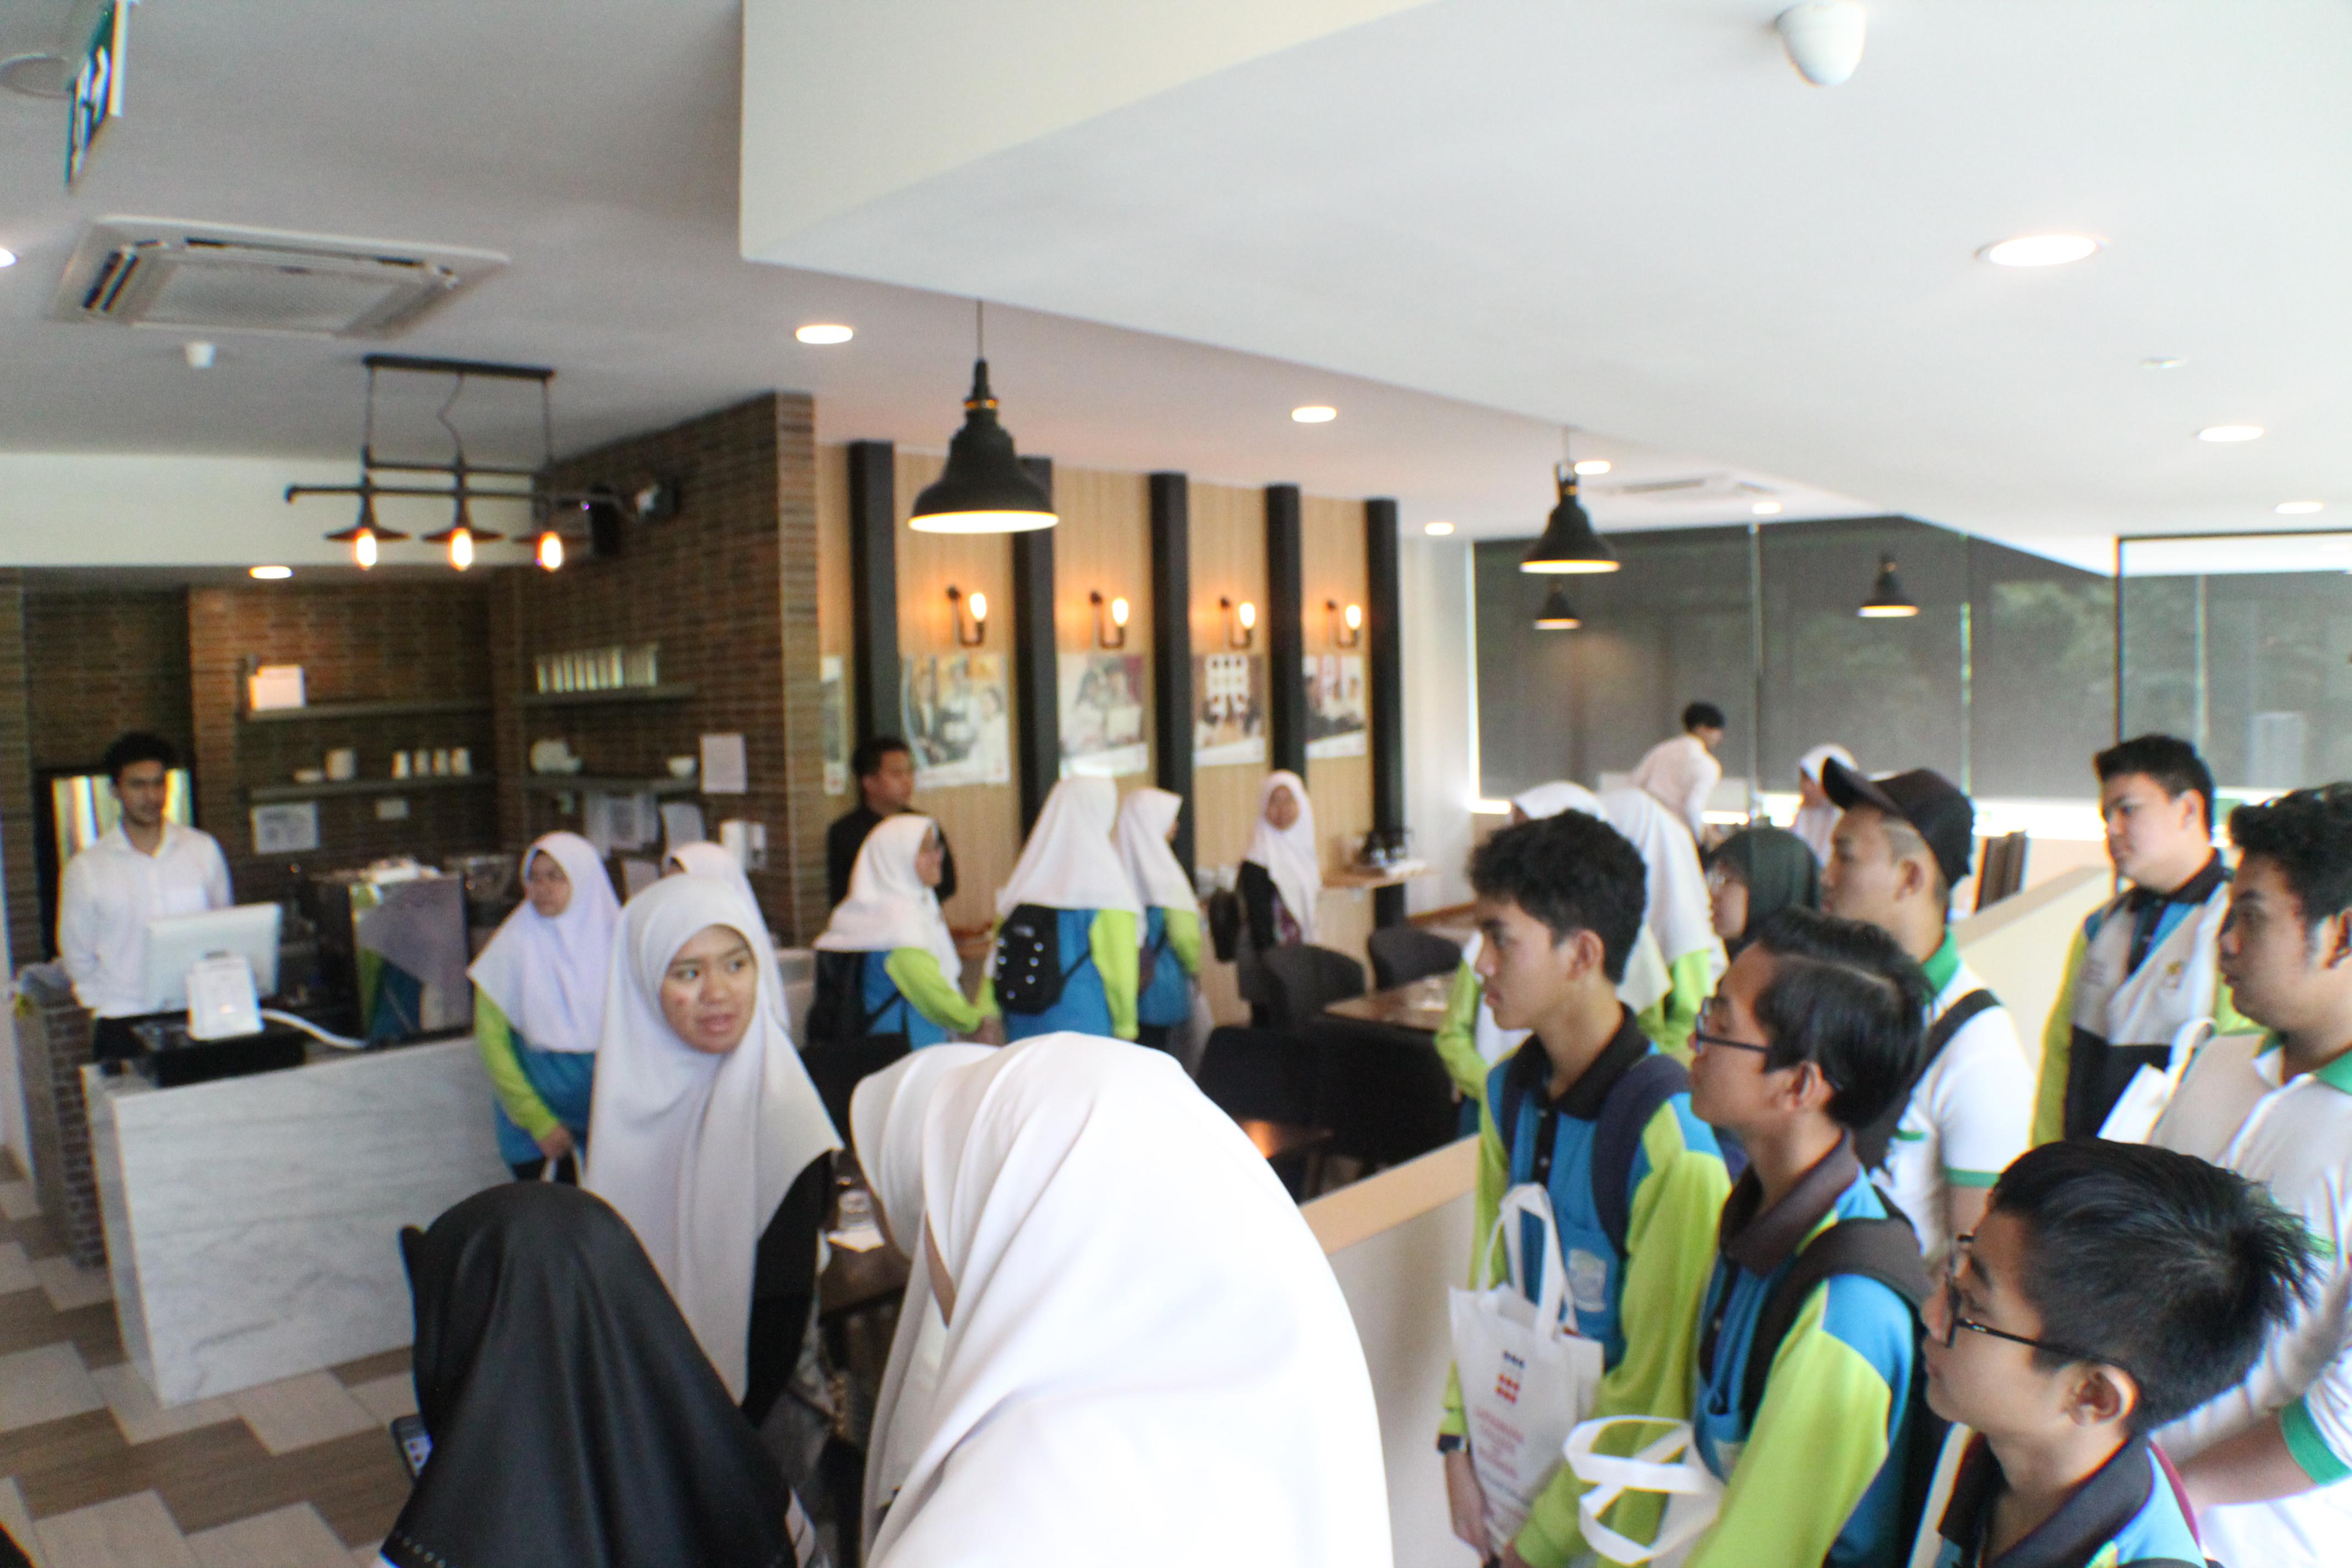 Visit by SMPAPHRSB